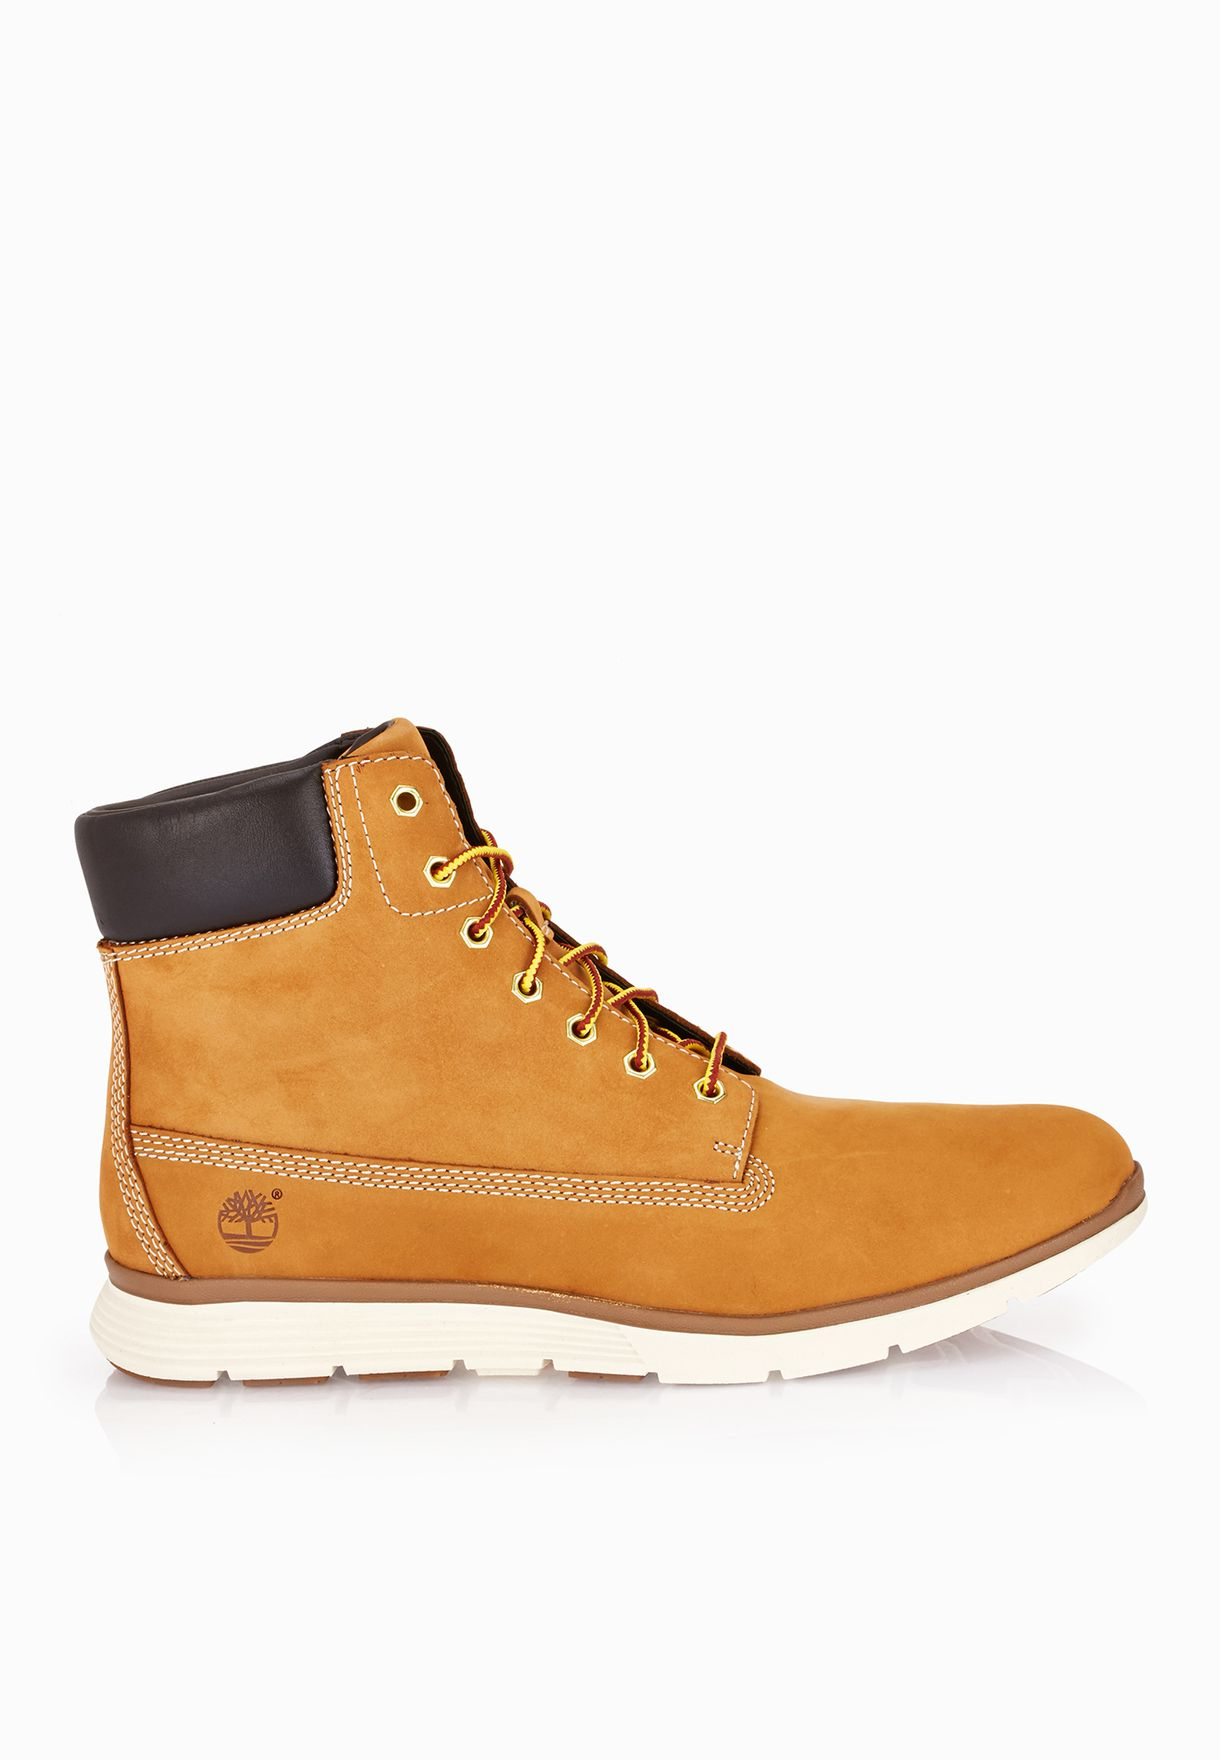 "Killington 6"" Boots"